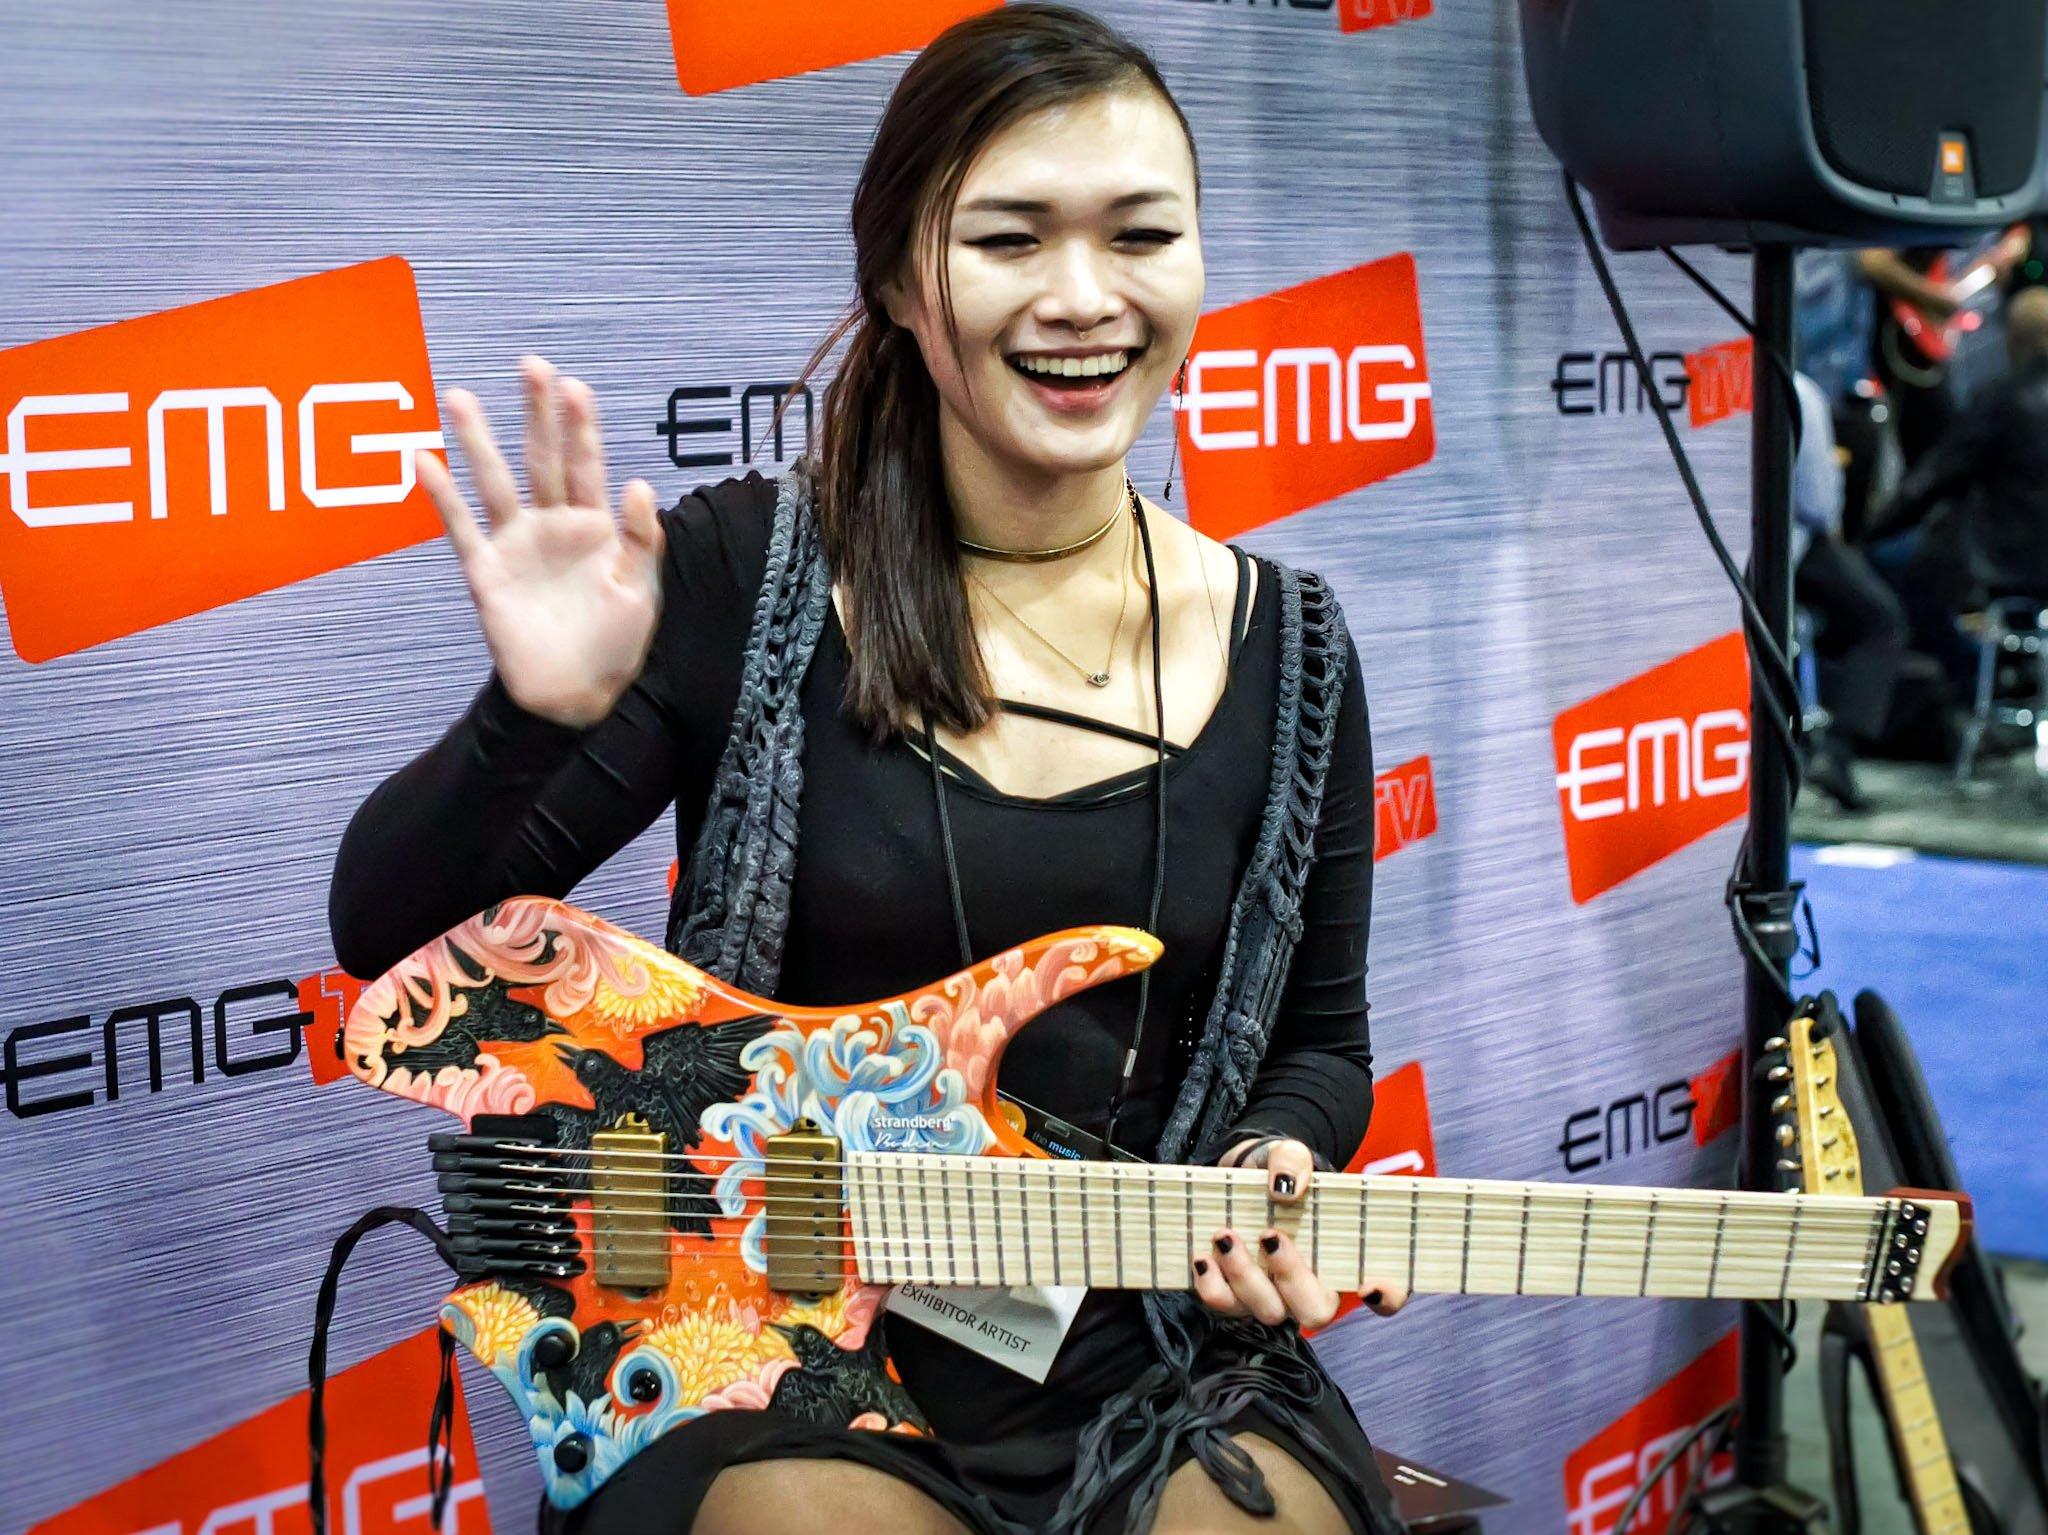 Zeraram a brincadeira - Strandberg fanned true temperament headless guitar DI_FBEFXgAAfp3N?format=jpg&name=large